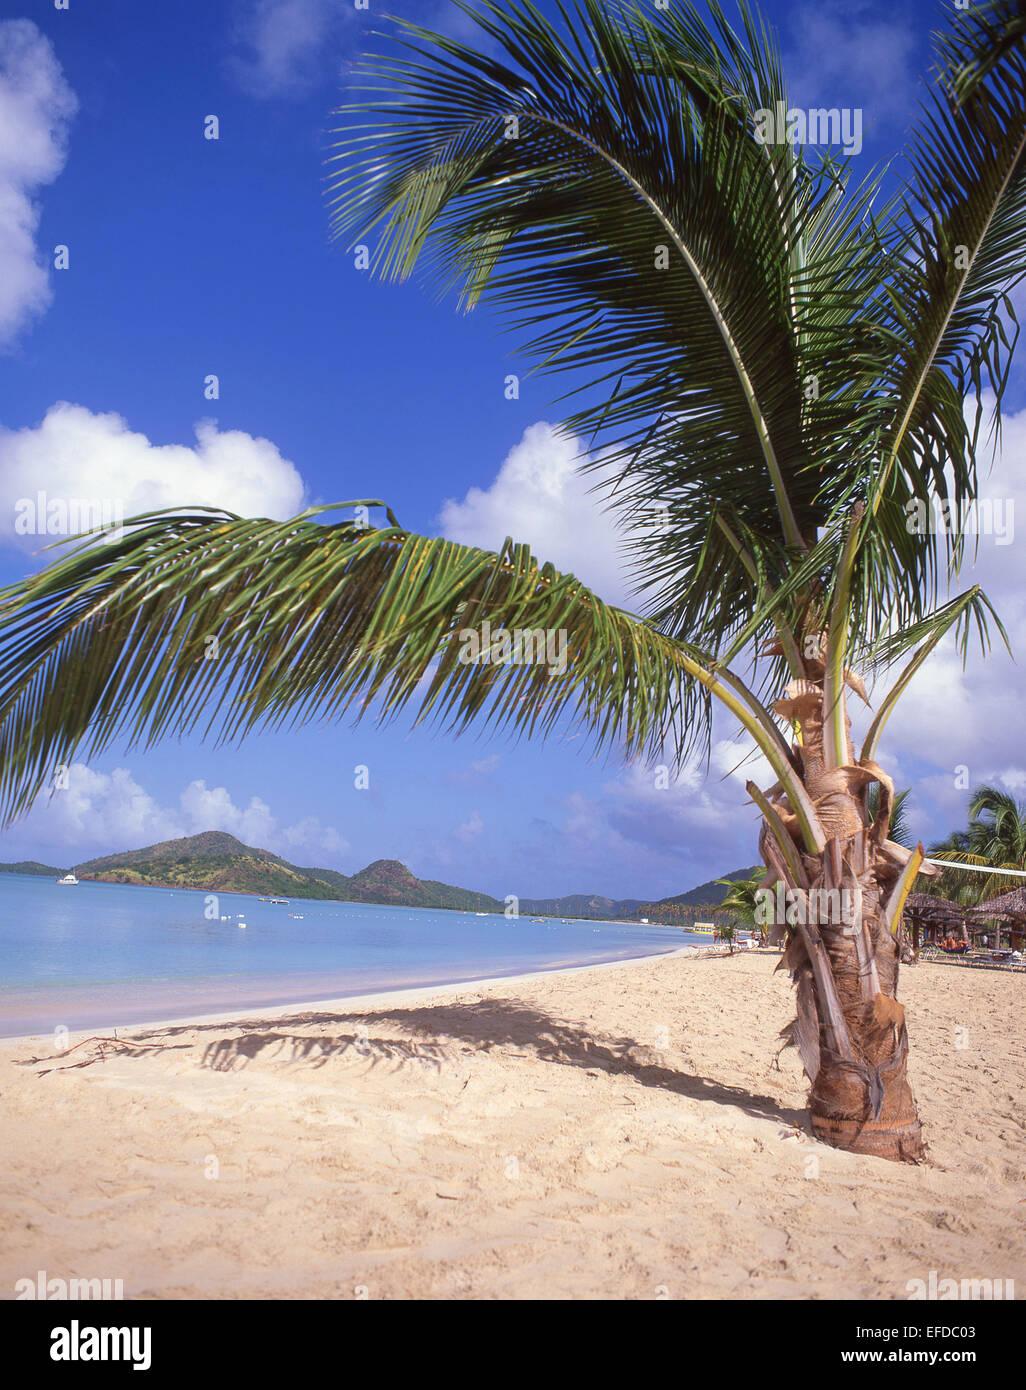 Jolly Beach Resort & Spa, Saint Mary's Parish, Antigua, Antigua and Barbuda, Lesser Antilles, Caribbean - Stock Image